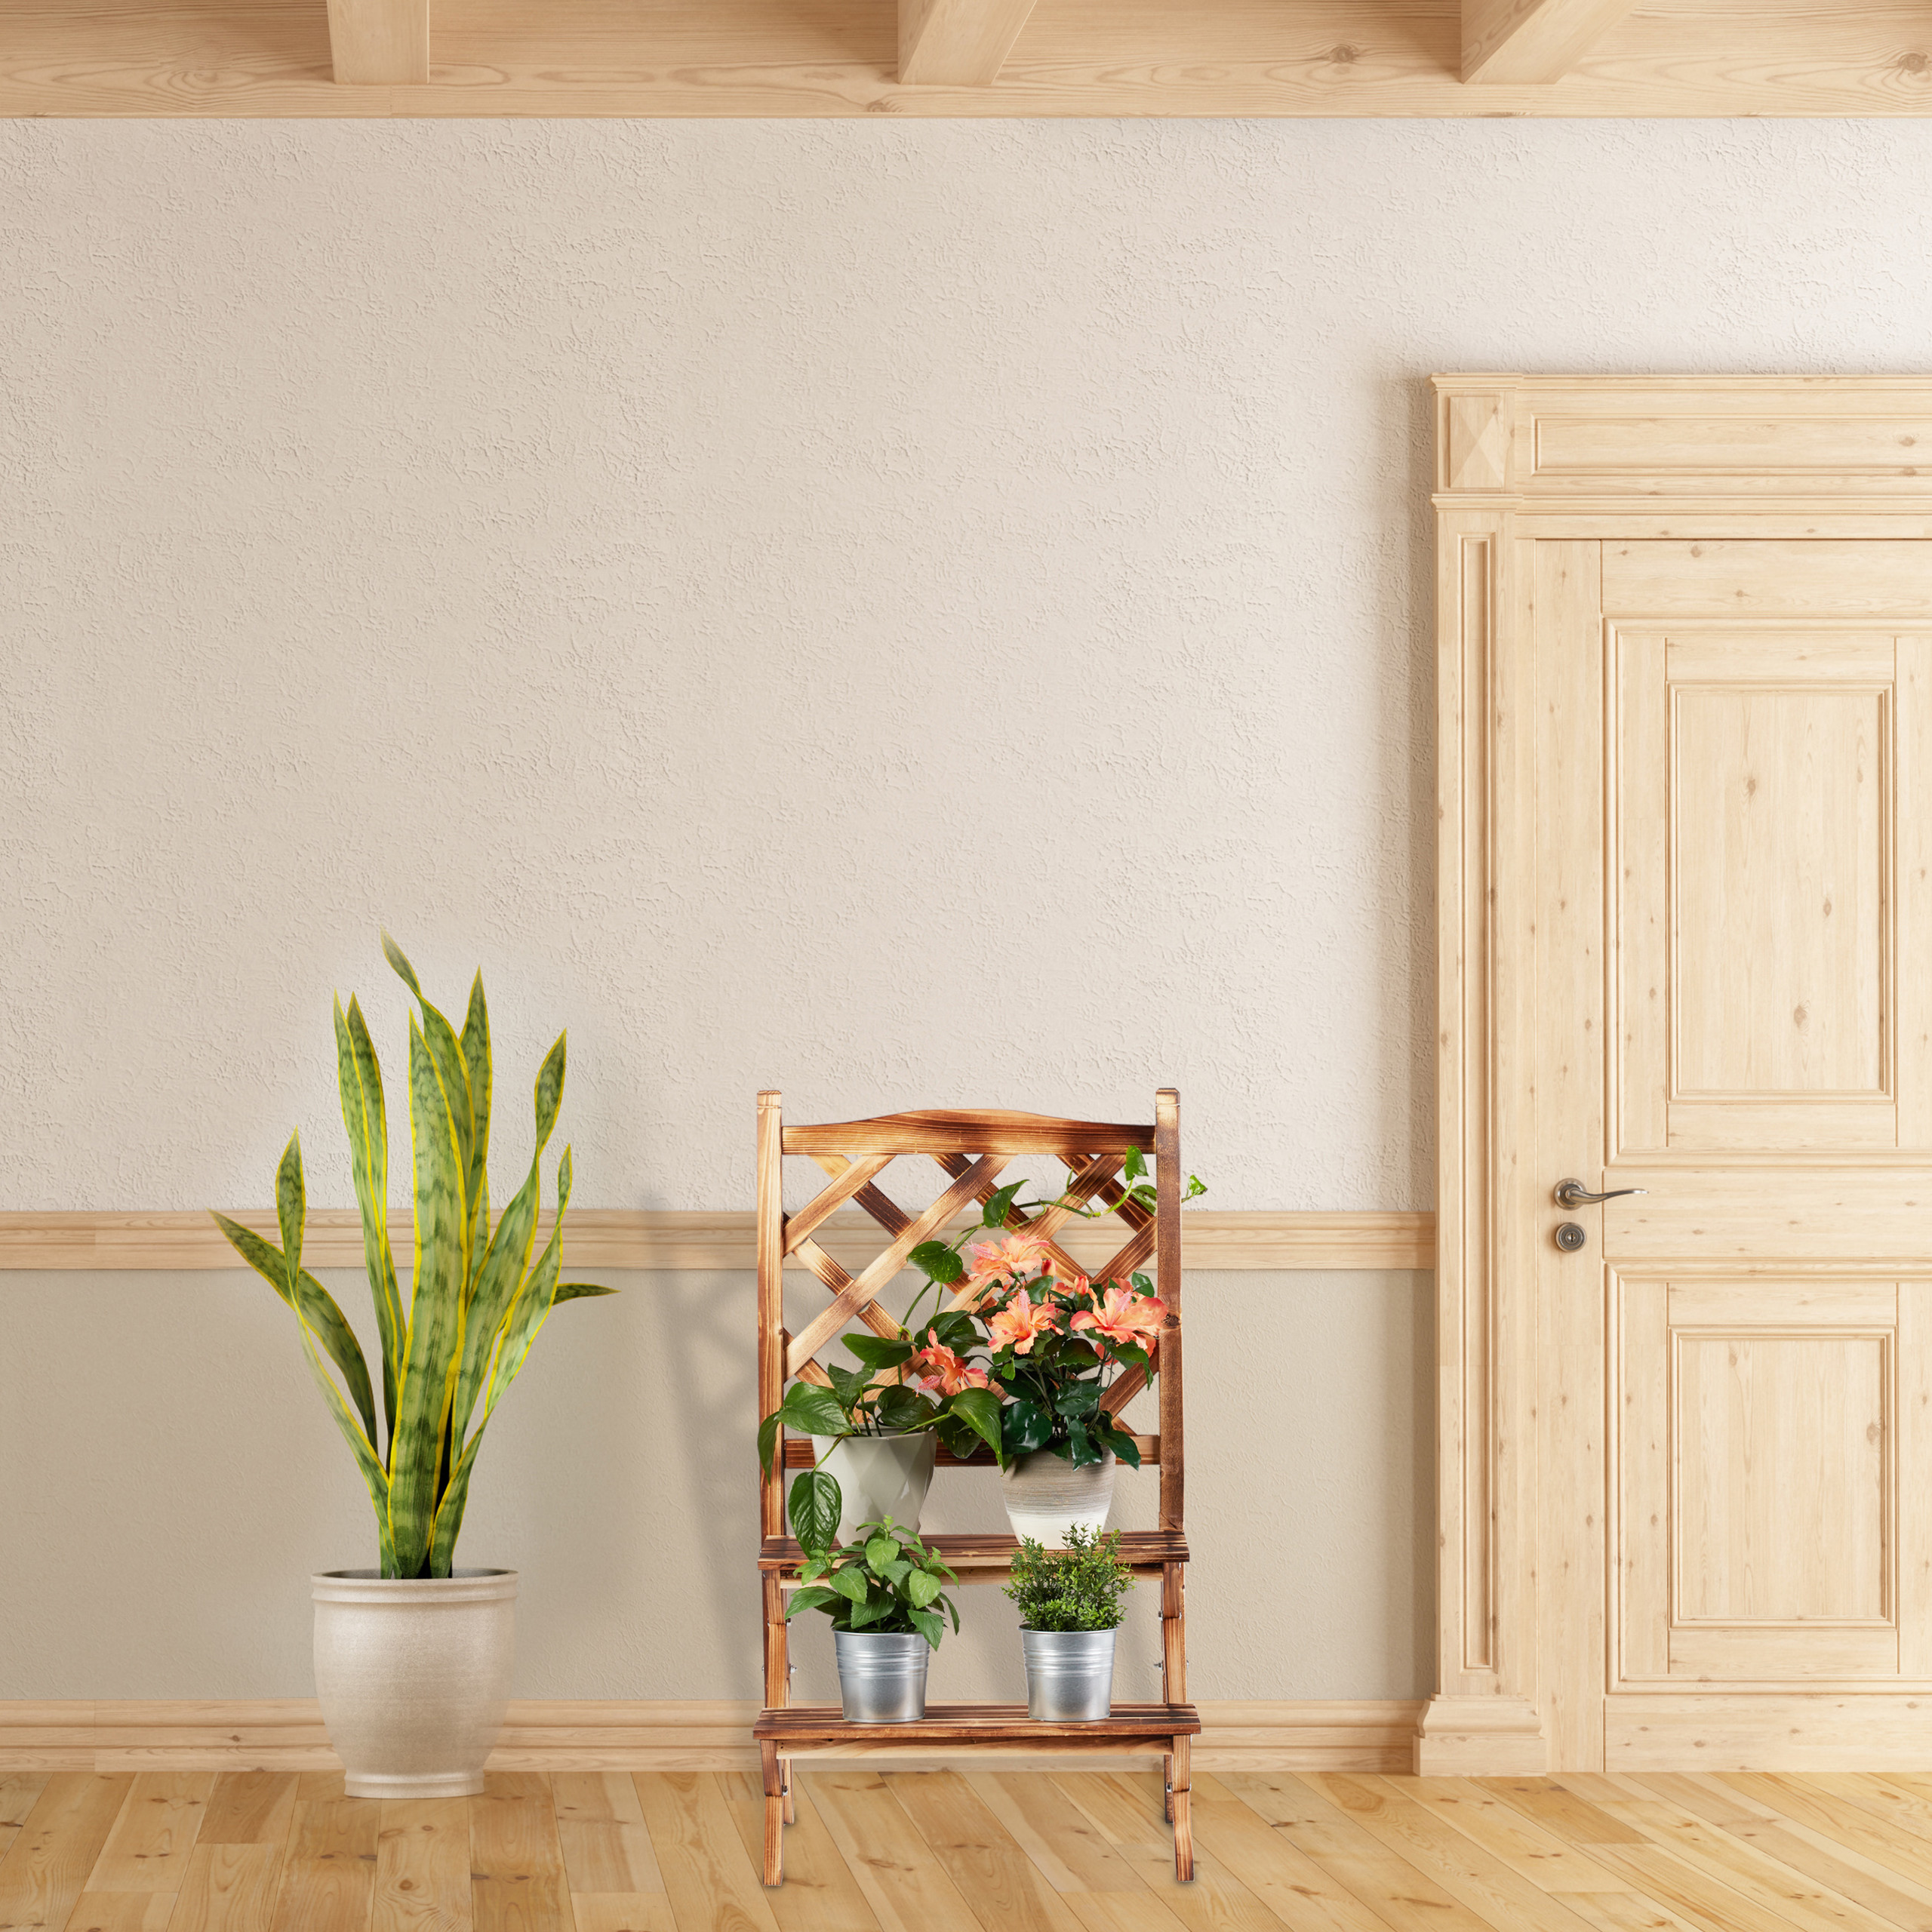 plantenrek-hout-plantentrap-plantenklimrek-bloemenrek-bloementrap miniatuur 12